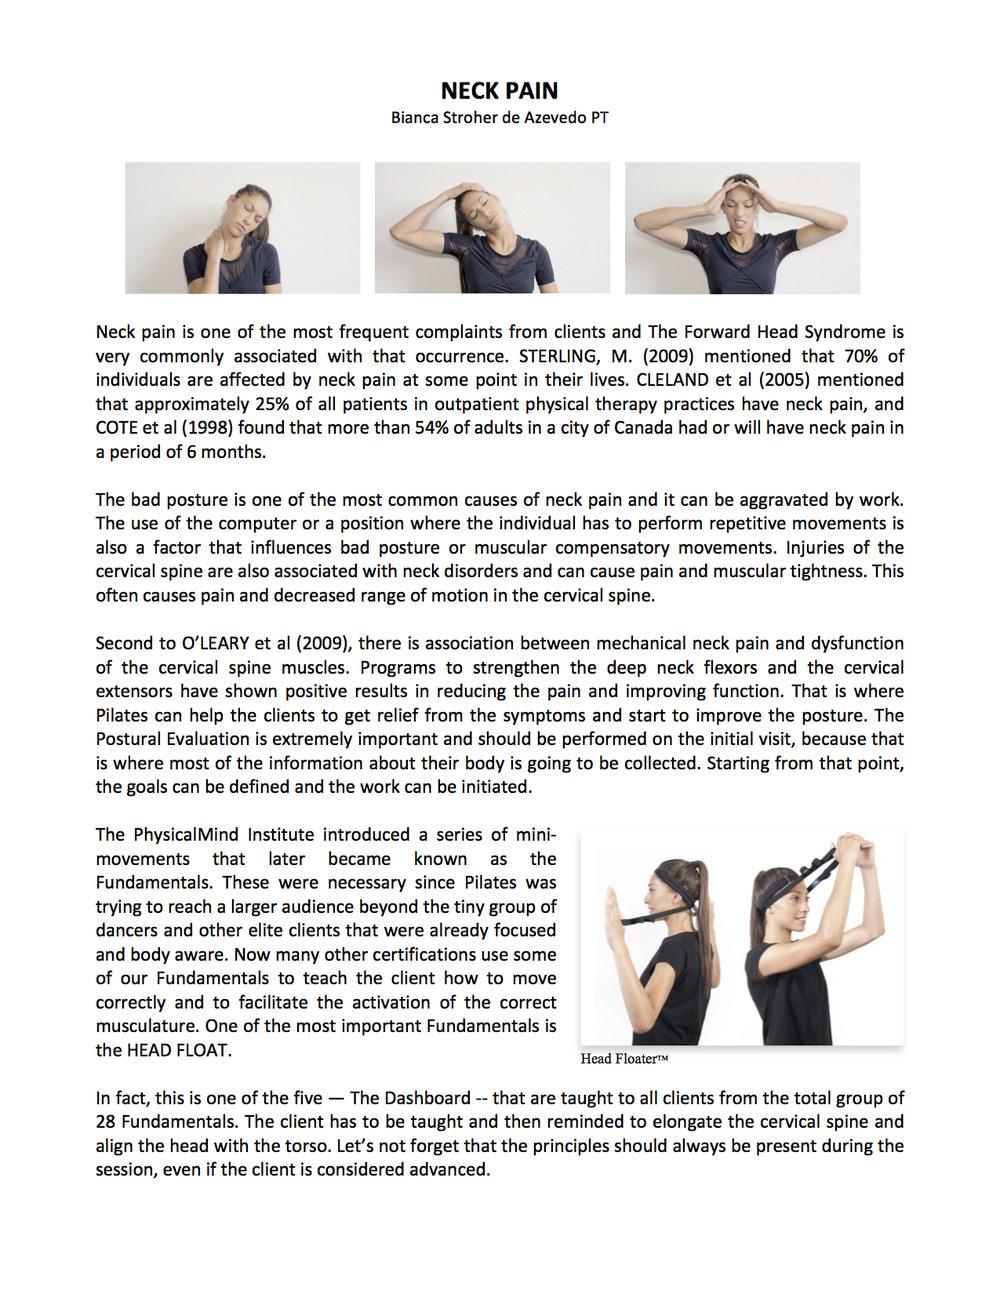 NECK-PAIN-PDF2_1.jpg